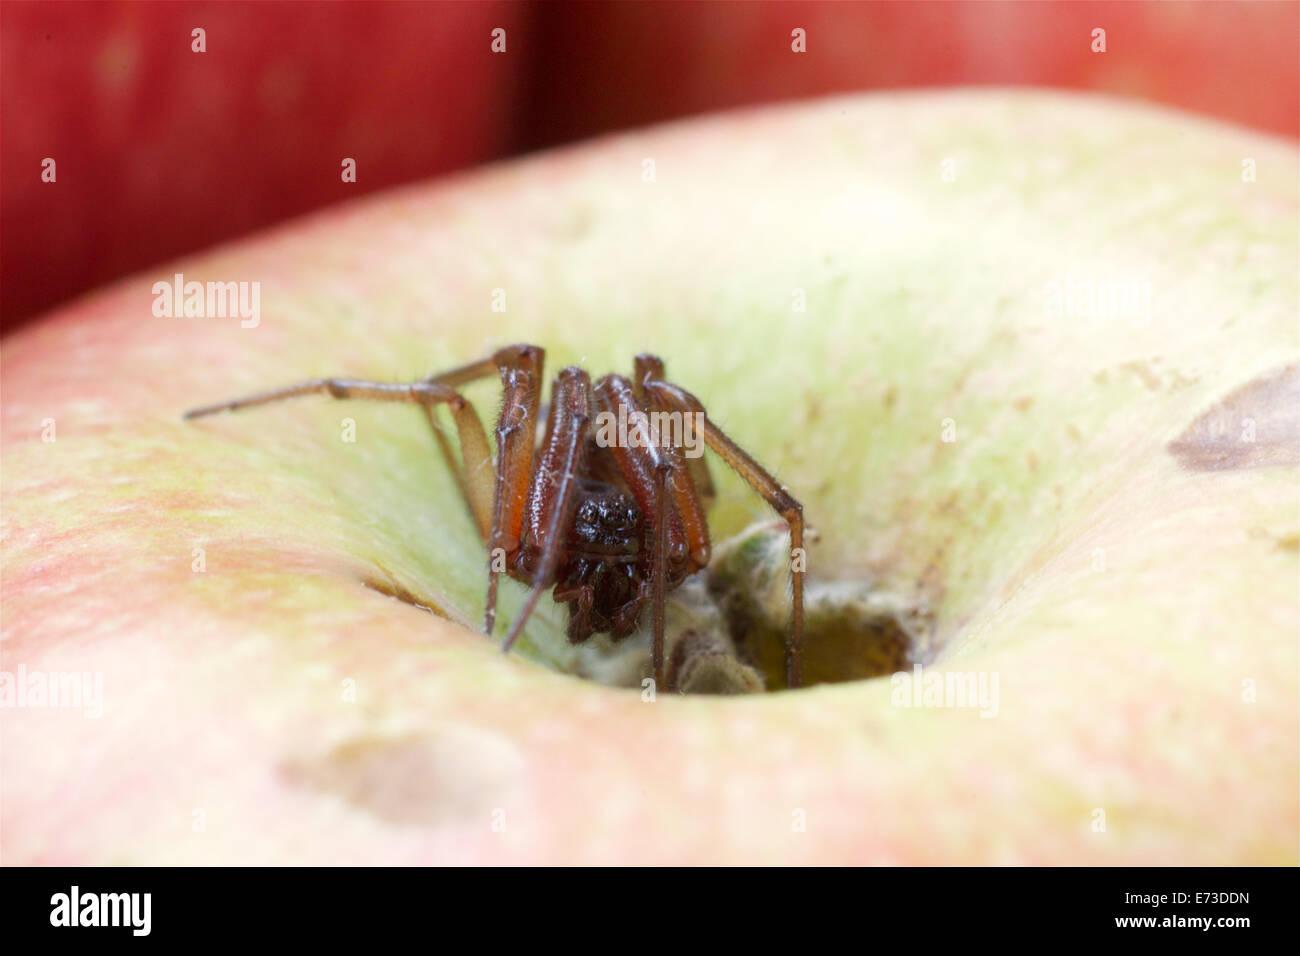 Noble false widow spider - Stock Image